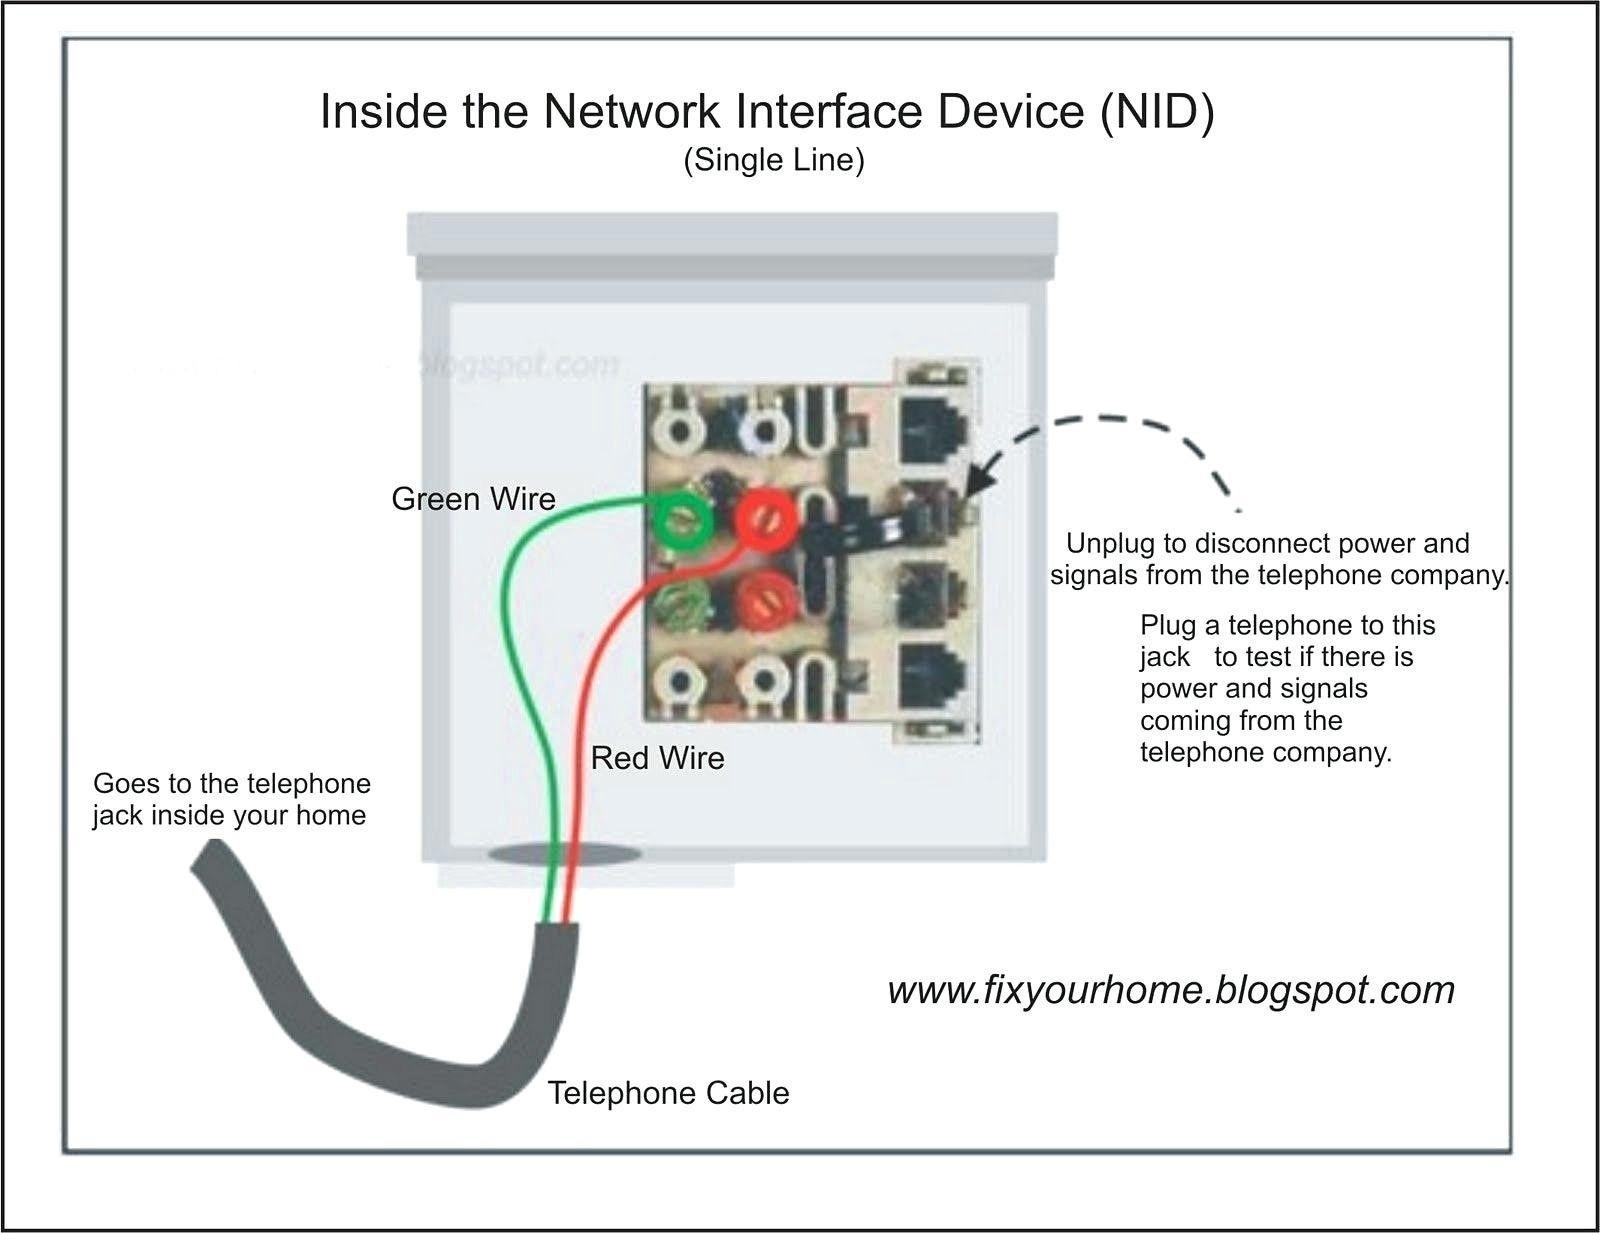 New Sprinkler System Wiring Diagram In 2020 Wireless Router Phone Jack Telephone Jack